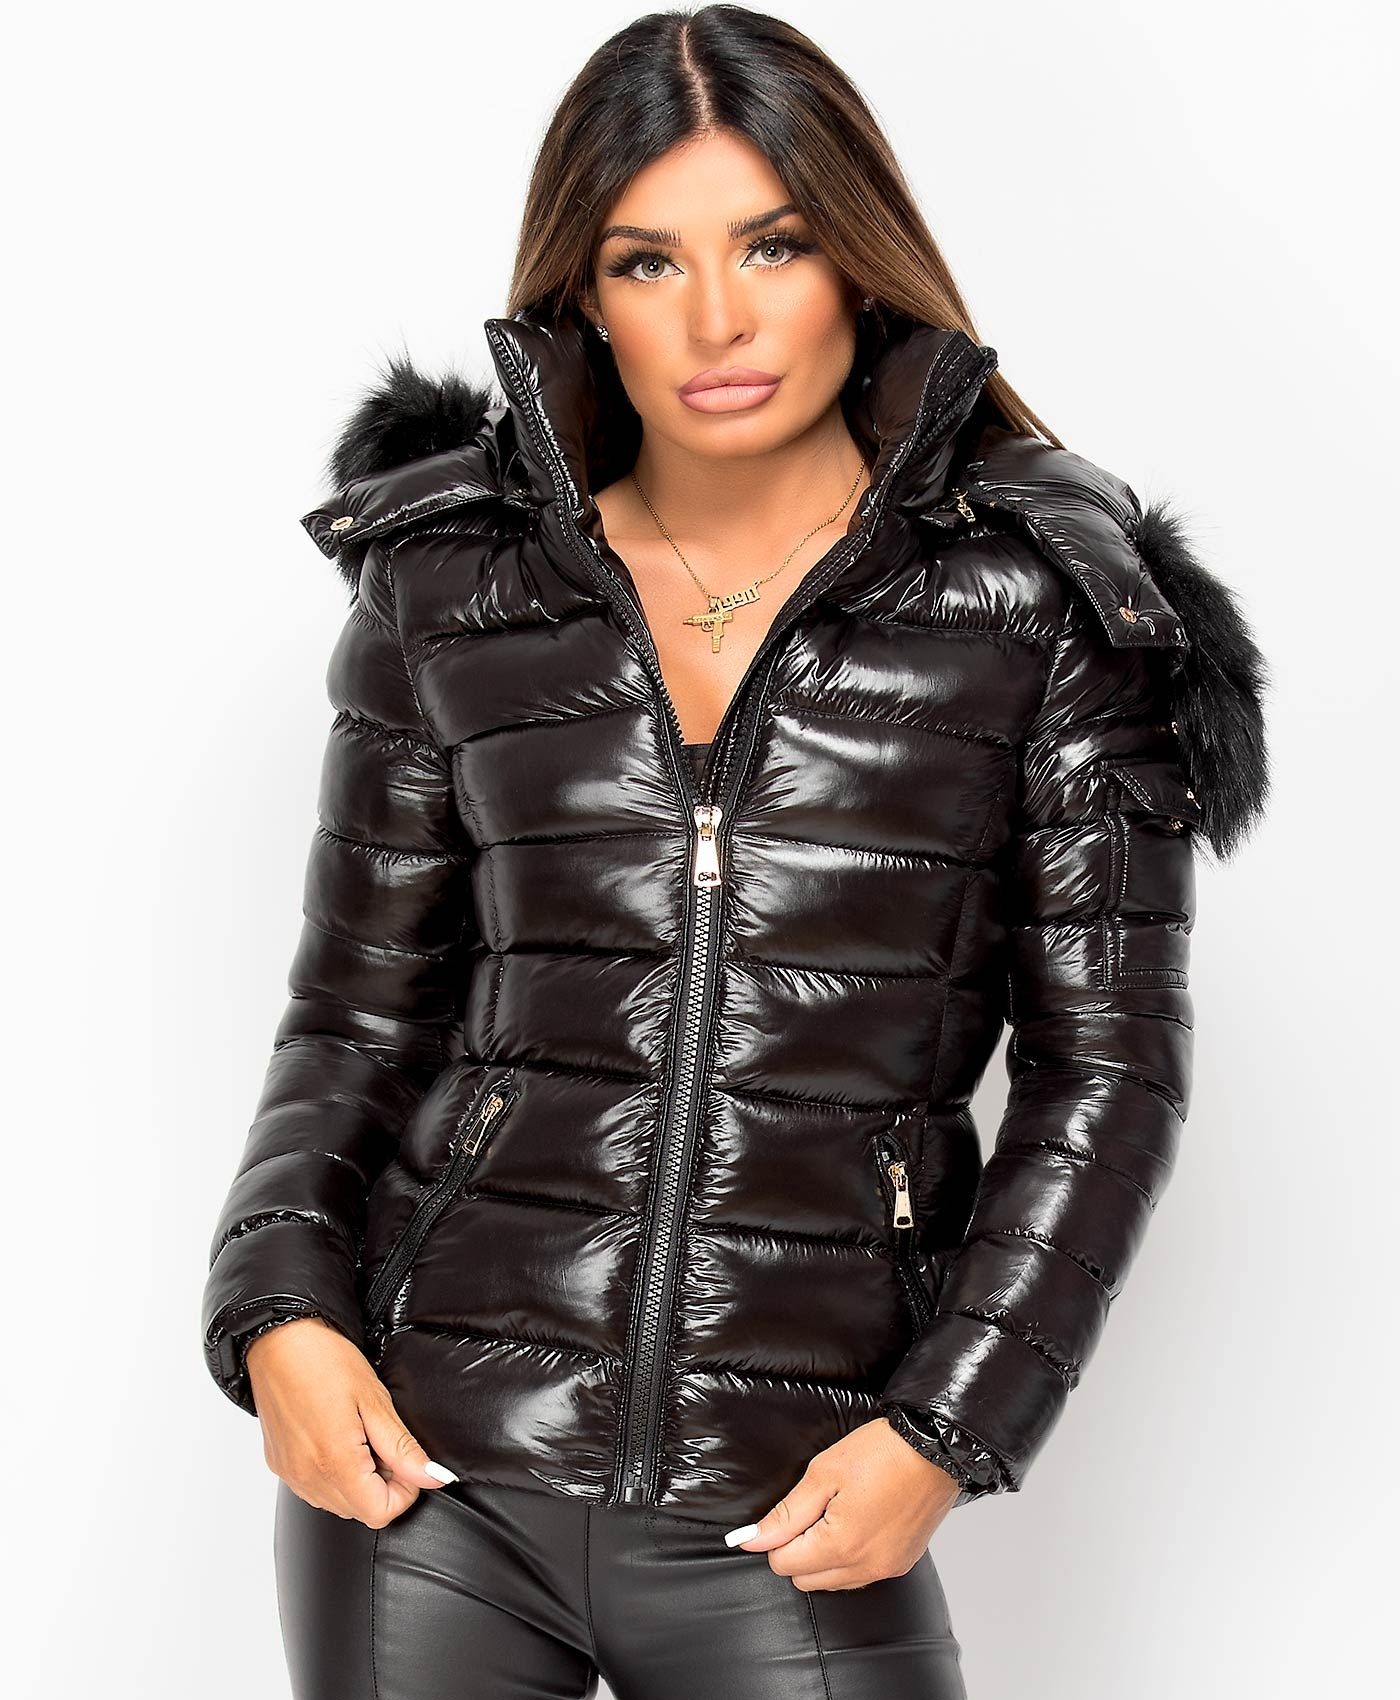 Women S Puffer Quilted Wet Look Shiny Jacket Padded Faux Fur Hooded Winter Coat Ebay Women S Puffer Shiny Jacket Hooded Winter Coat [ 1700 x 1400 Pixel ]